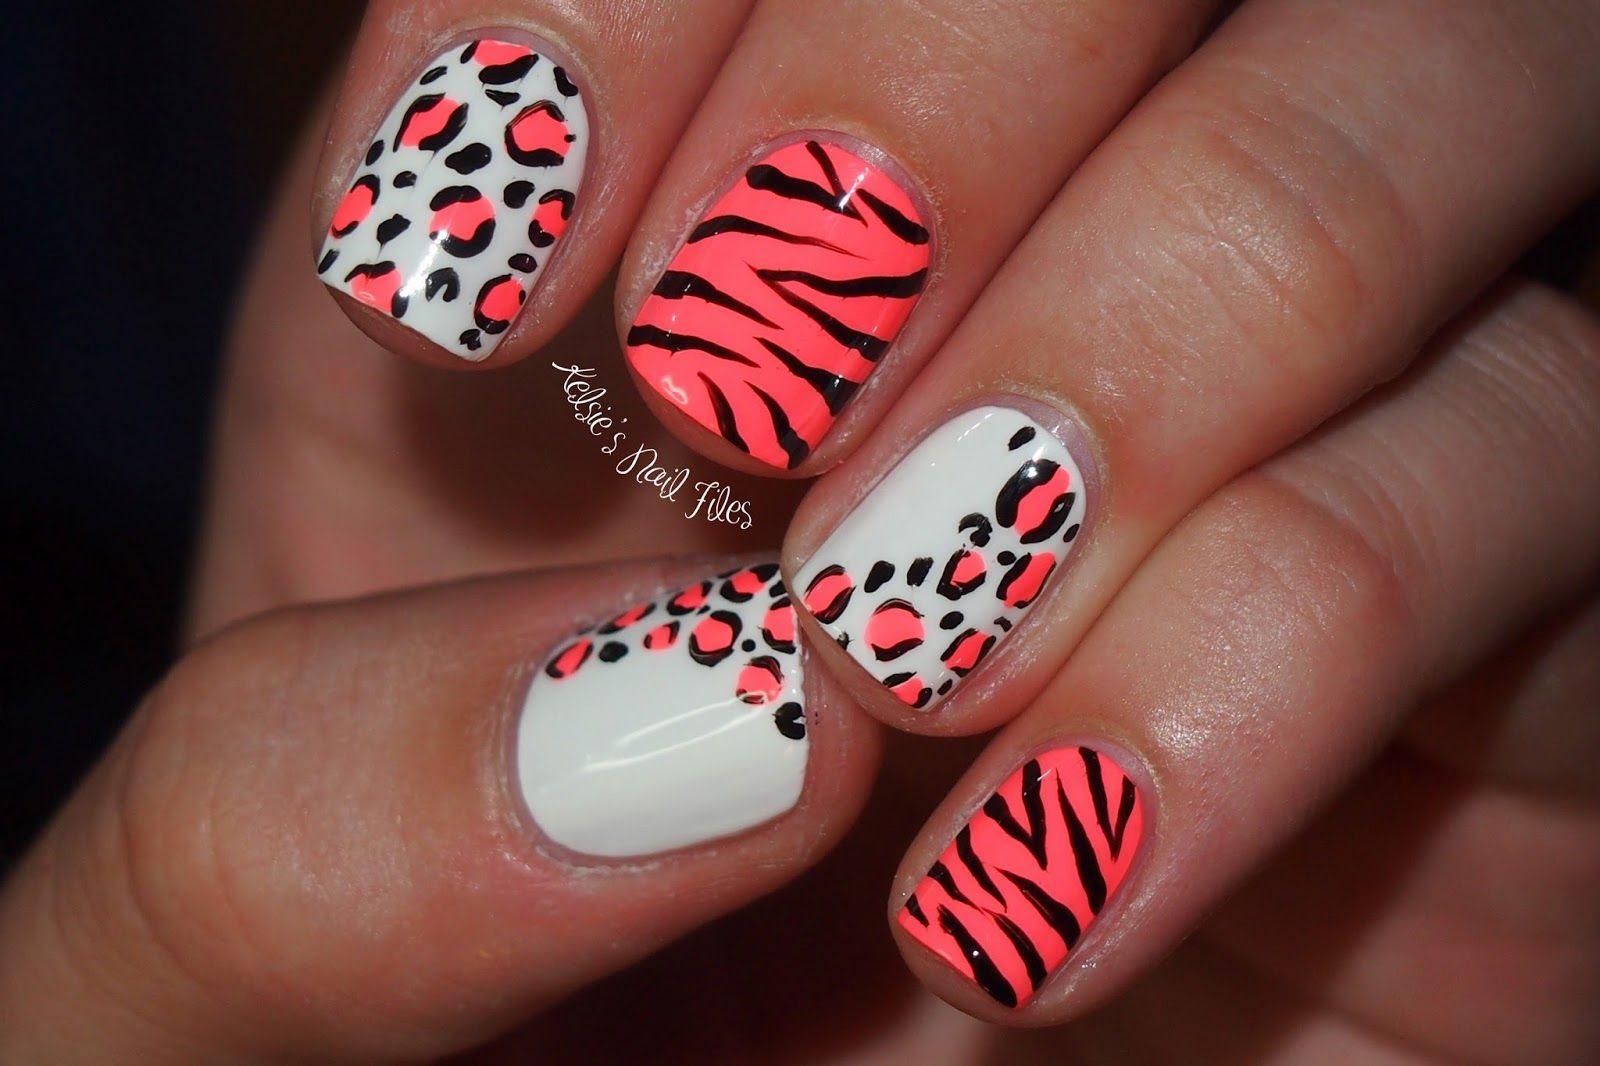 Animal Print Nail Art Design Idea With Zebra And Cheetah Pattern ...